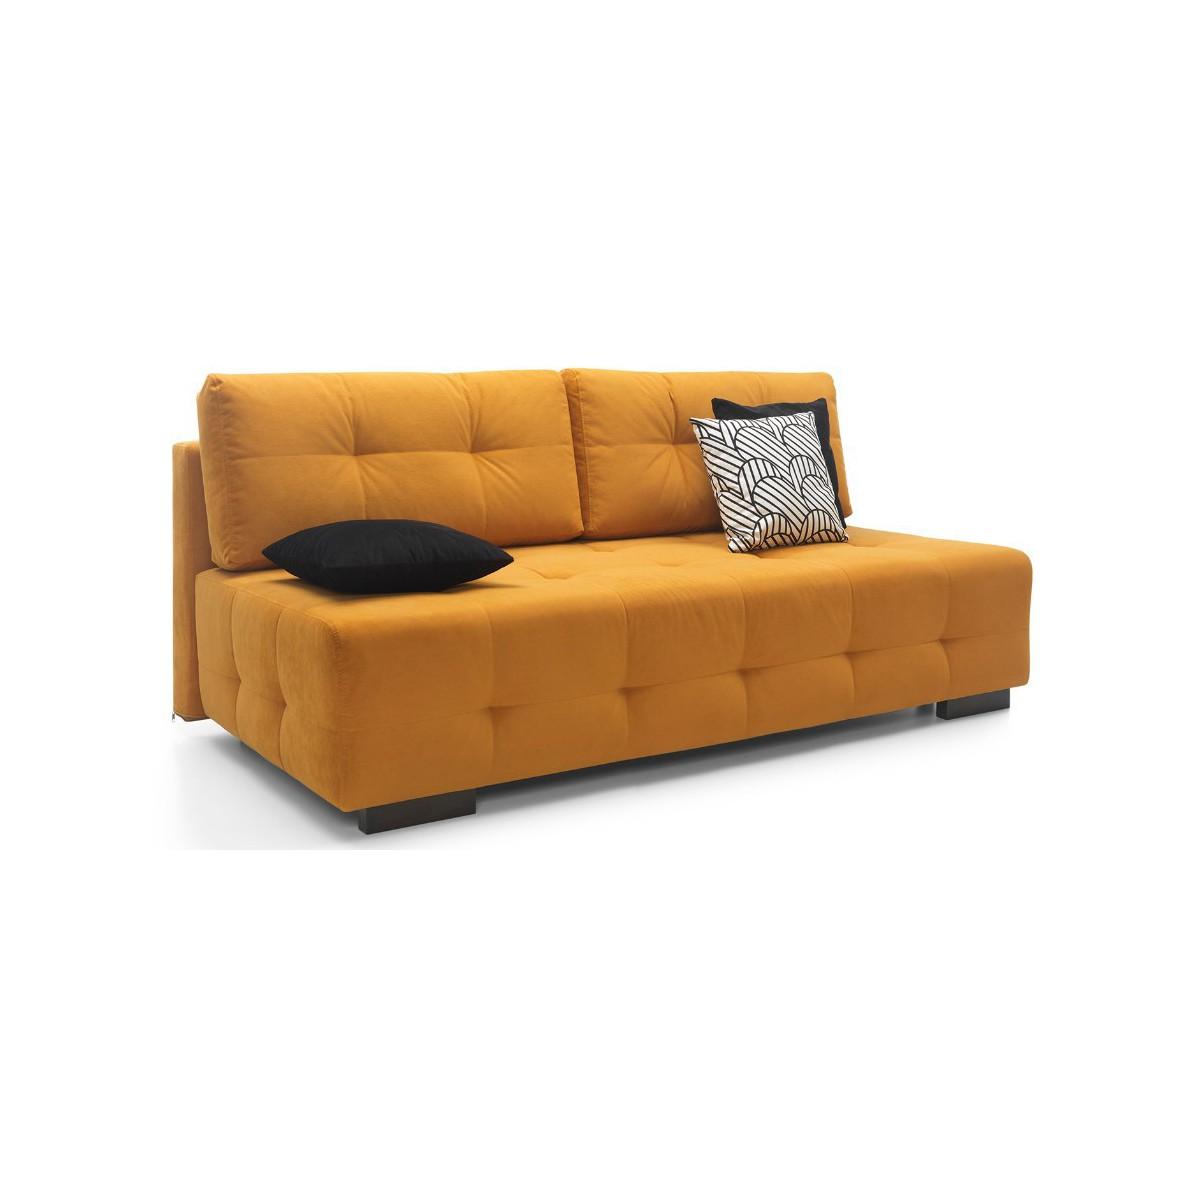 Rocco sofa